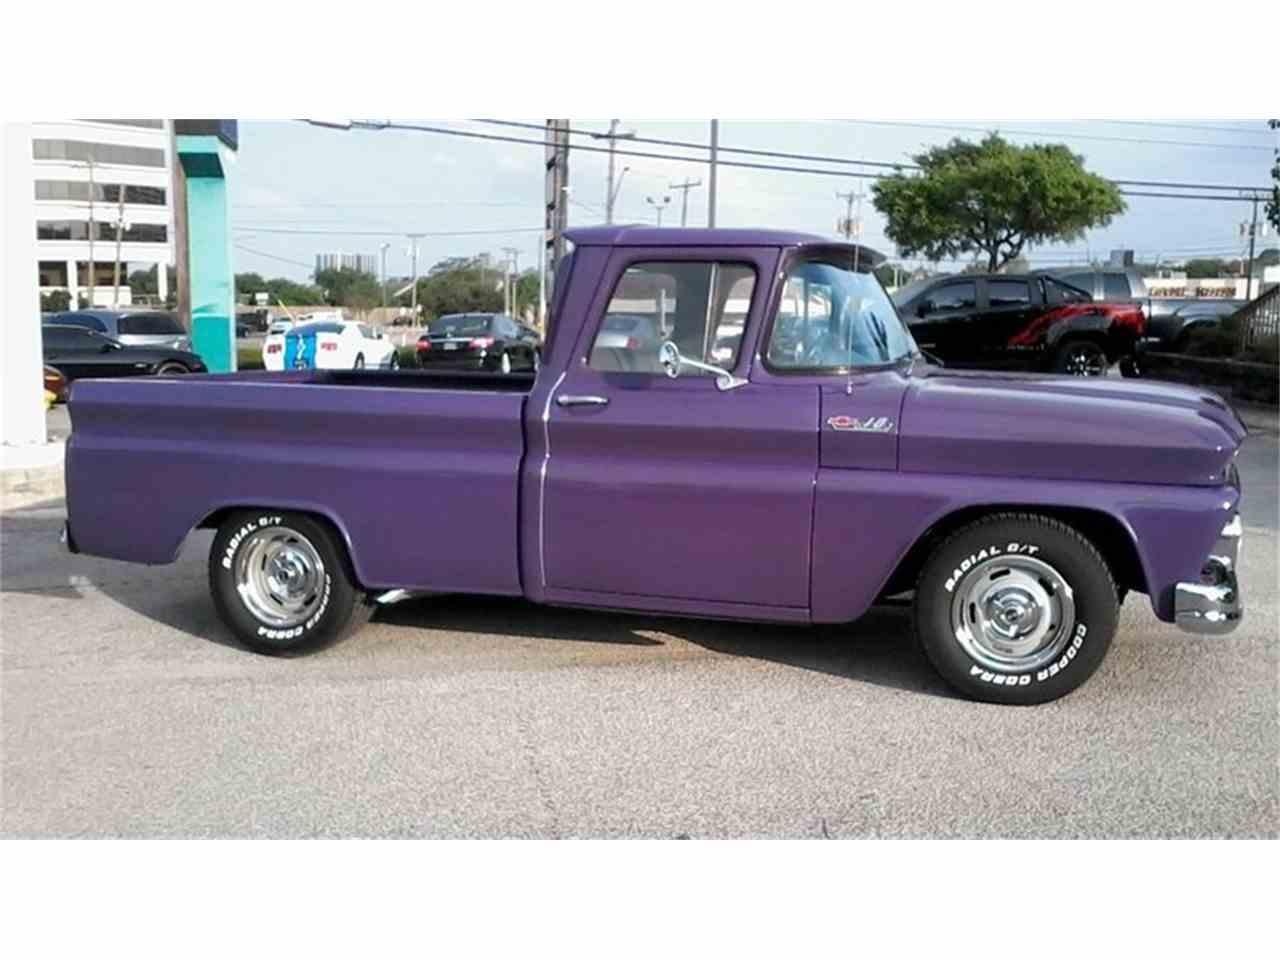 tx car kit autos pinterest on suvs midland chevrolet texas best images ss chevy camaro cars fincherstxbest